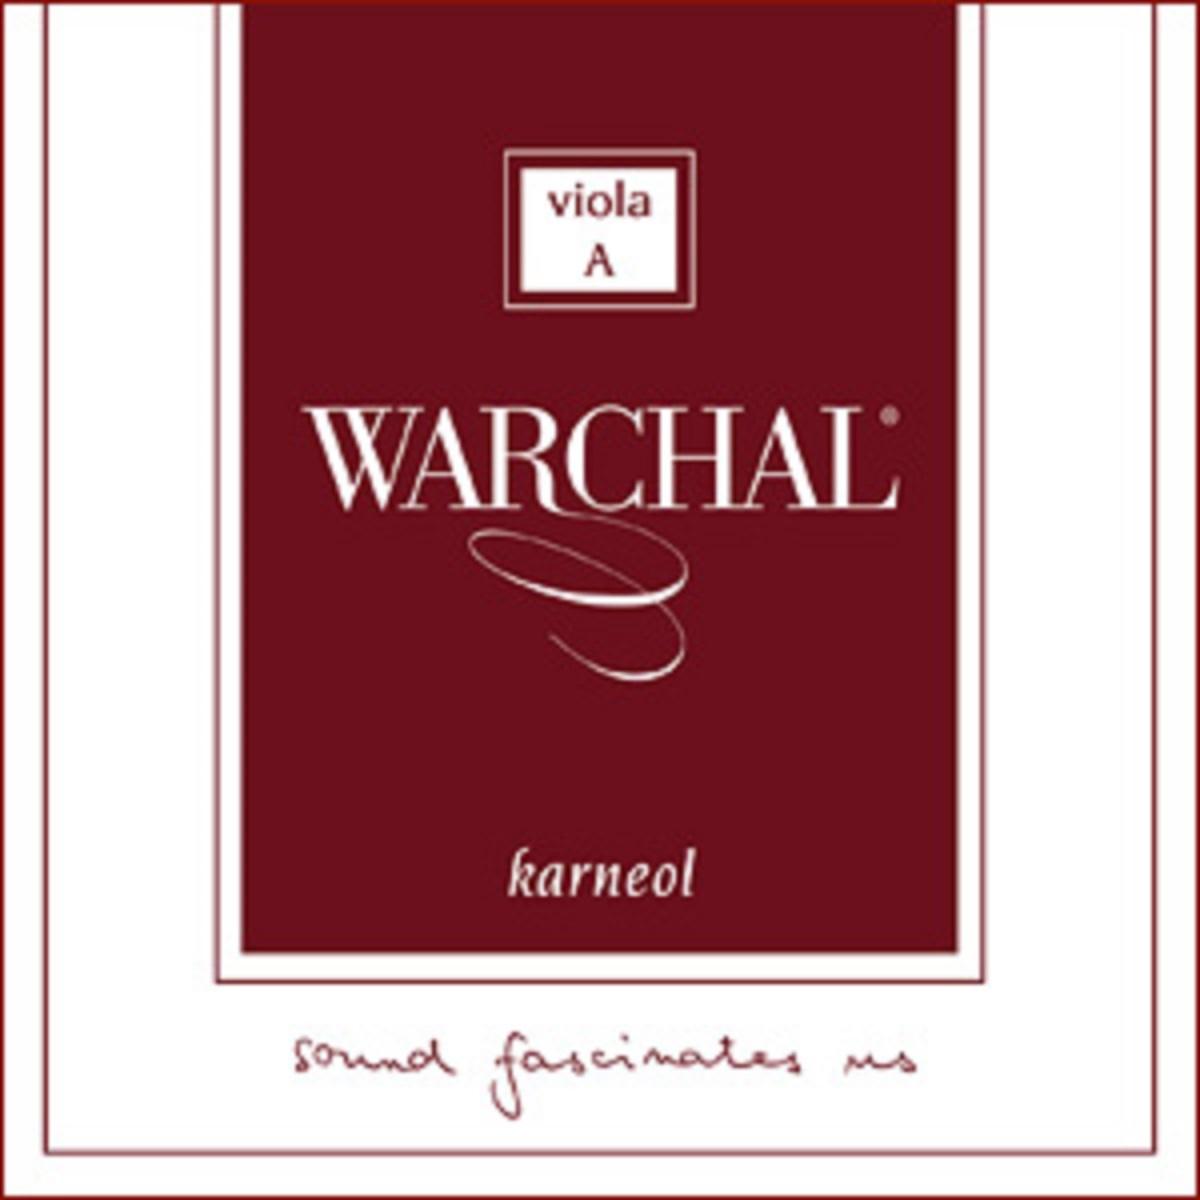 Комплект струн для альта Warchal Karneol 510L